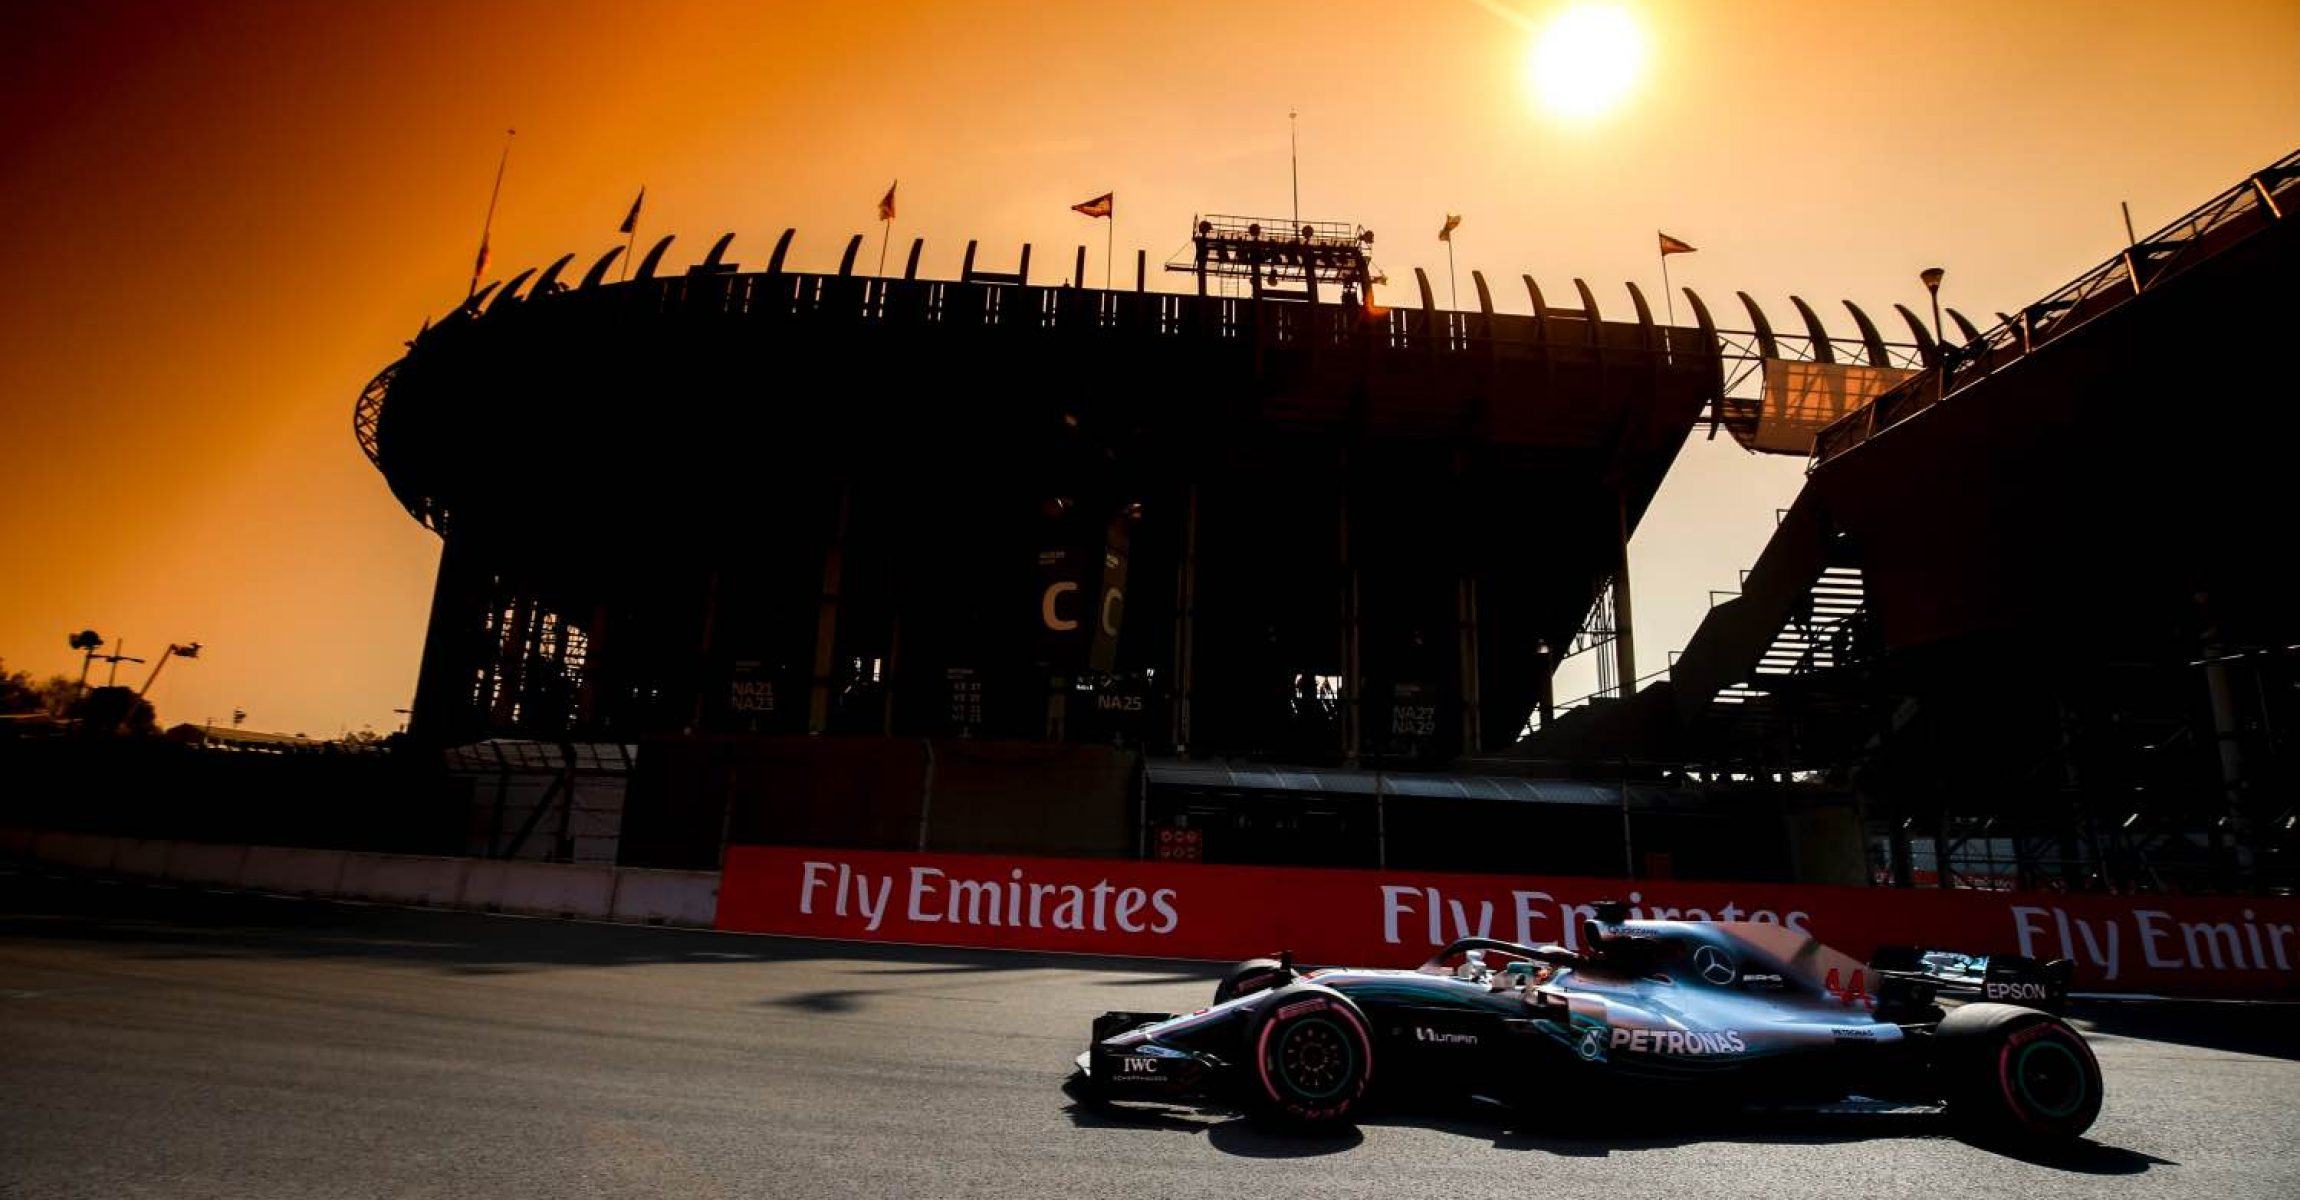 2018 Mexican Grand Prix, Friday - Wolfgang Wilhelm Lewis Hamilton Mercedes